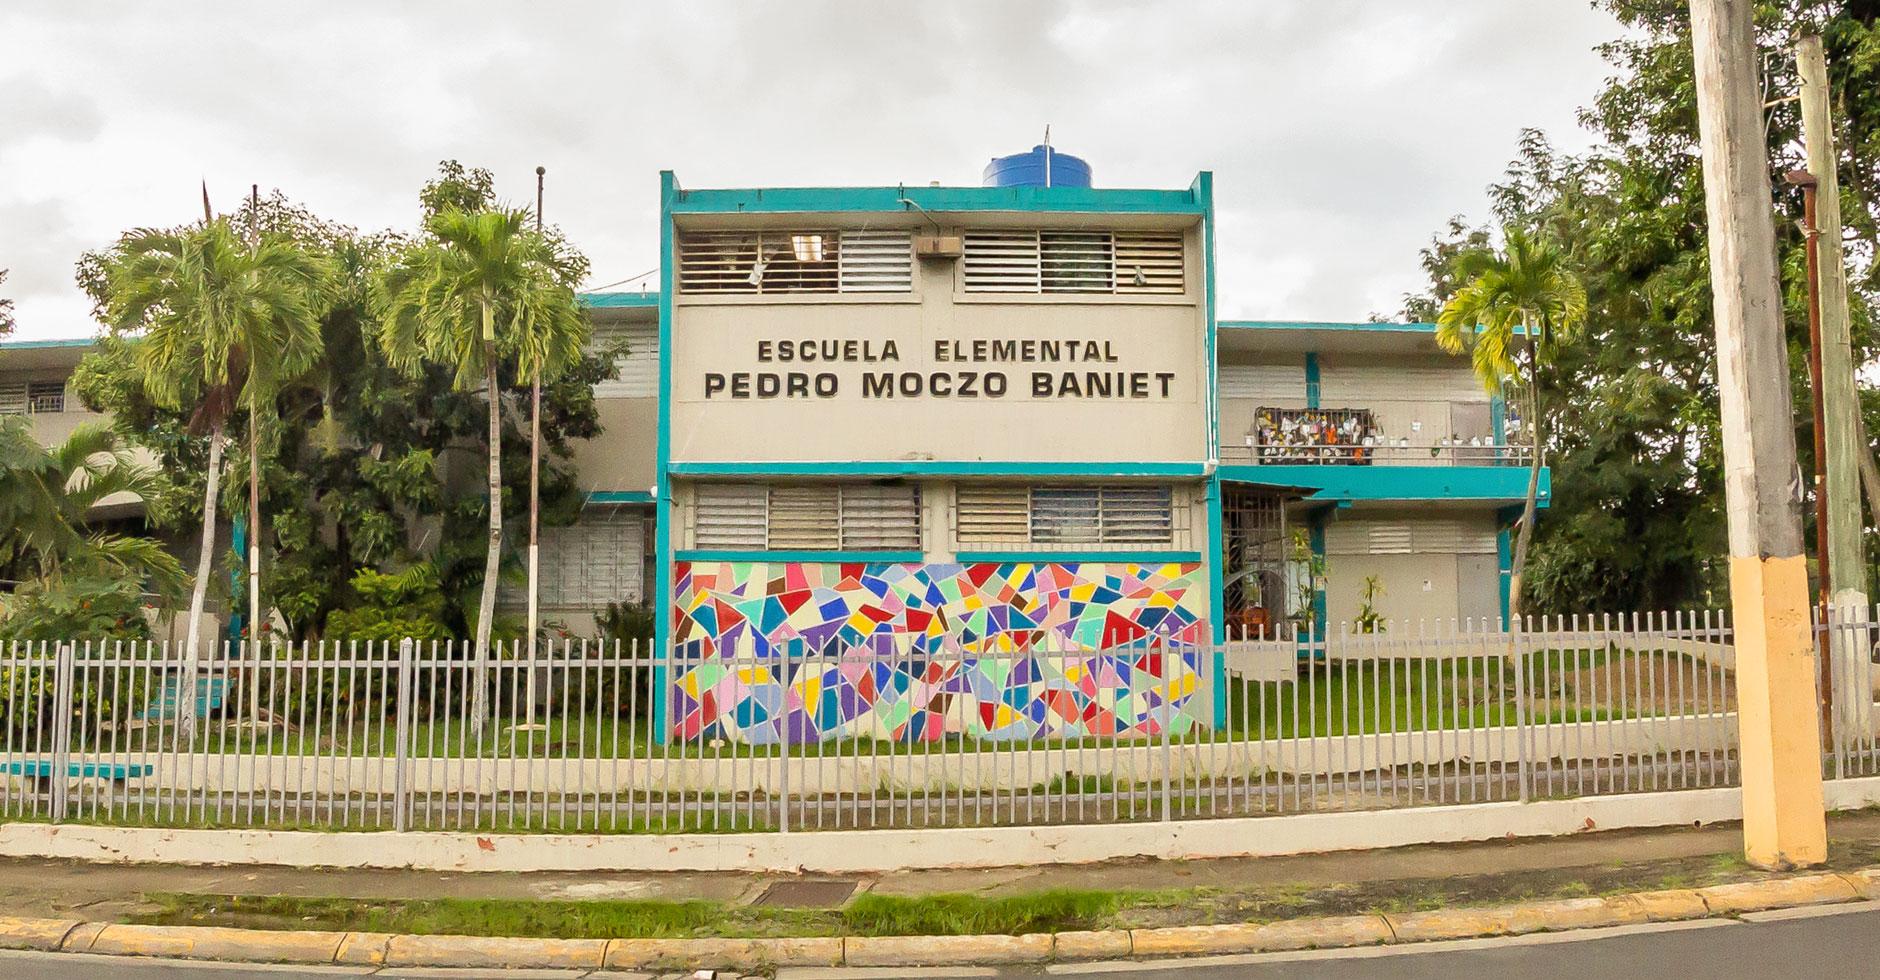 Escuela Elemental Pedro Mozco Baniet